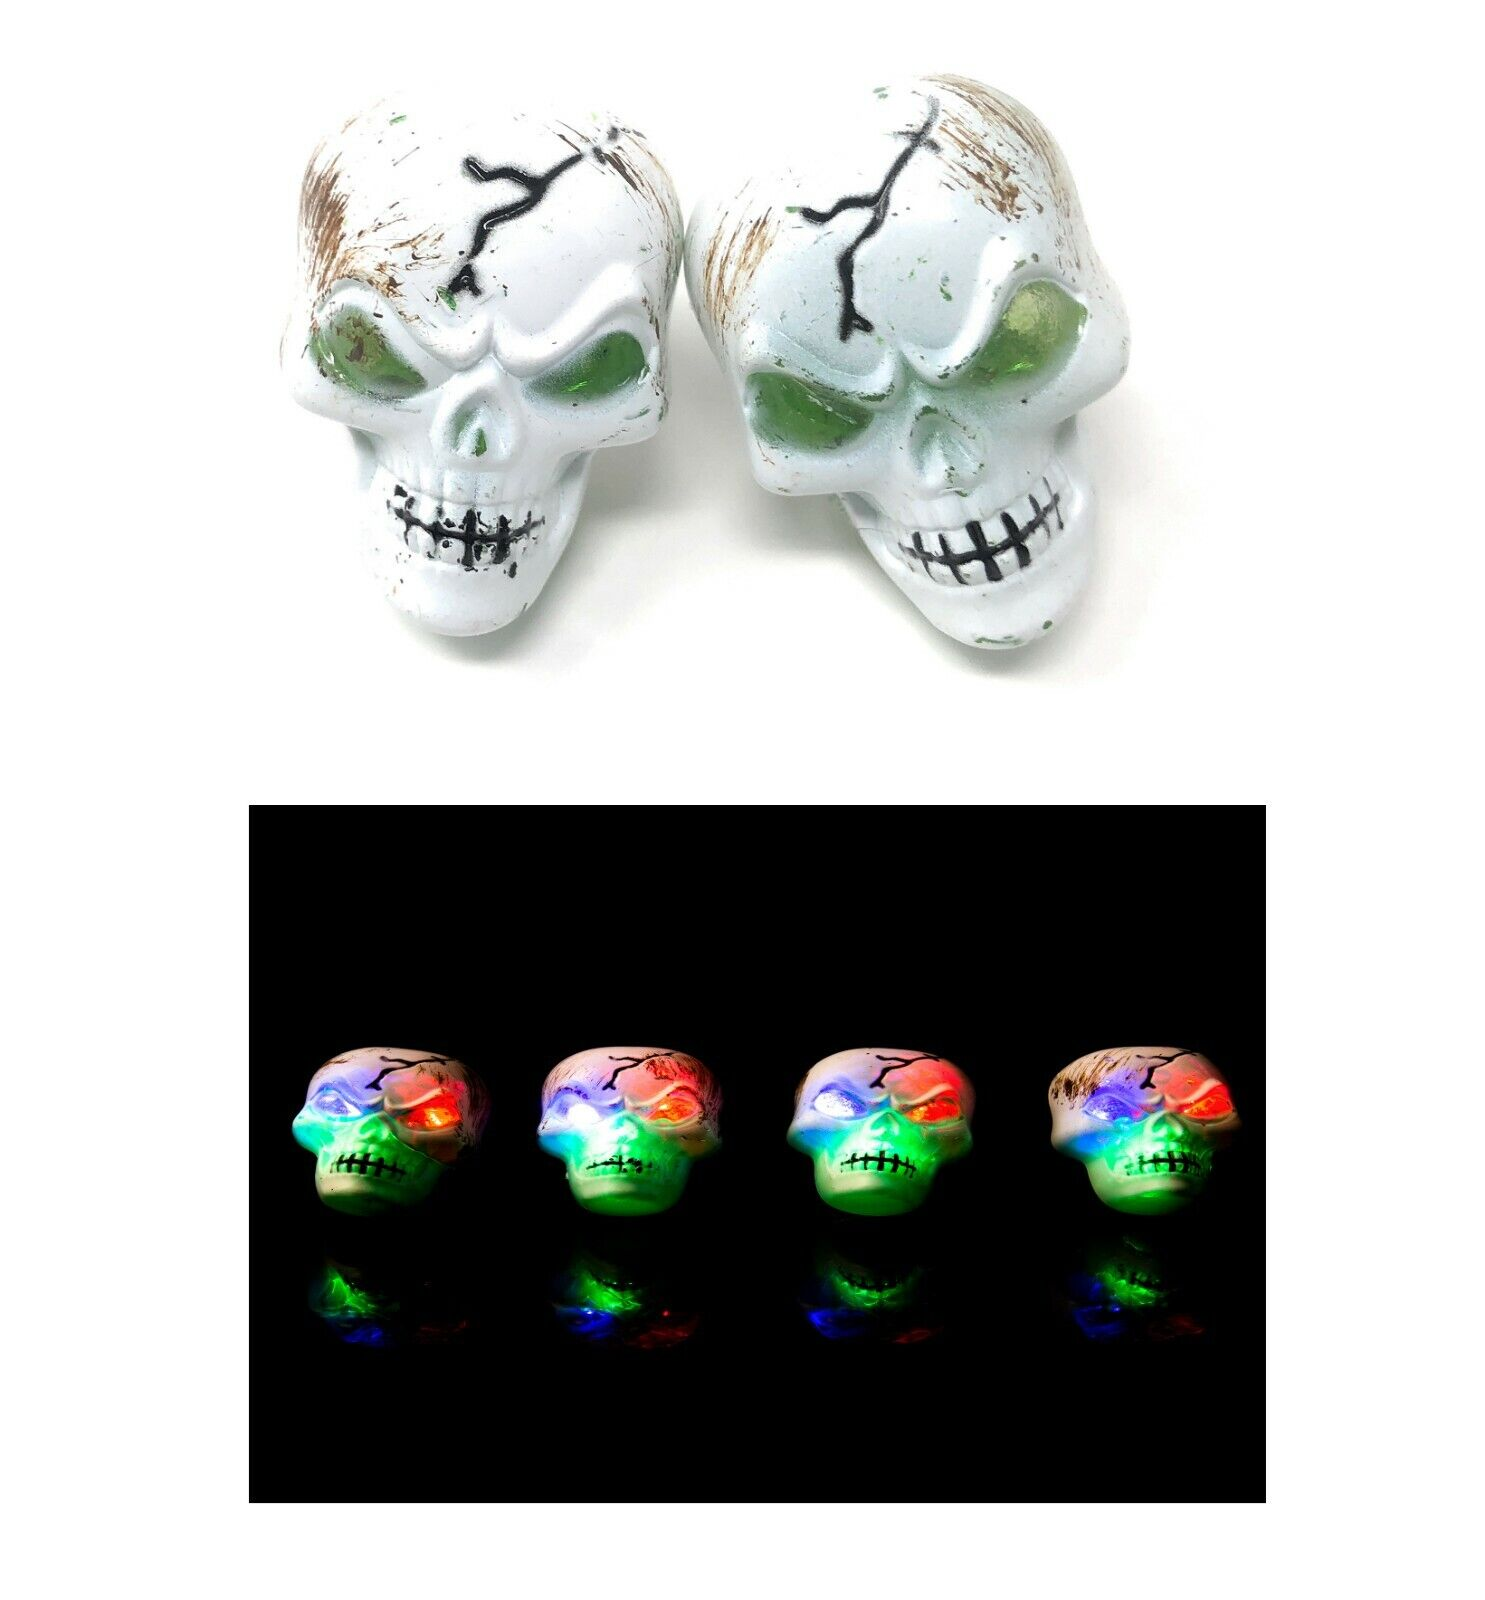 48 Skelett Blitzlicht Led Kunststoff Ringe Aufleuchtend Finger Spielzeug